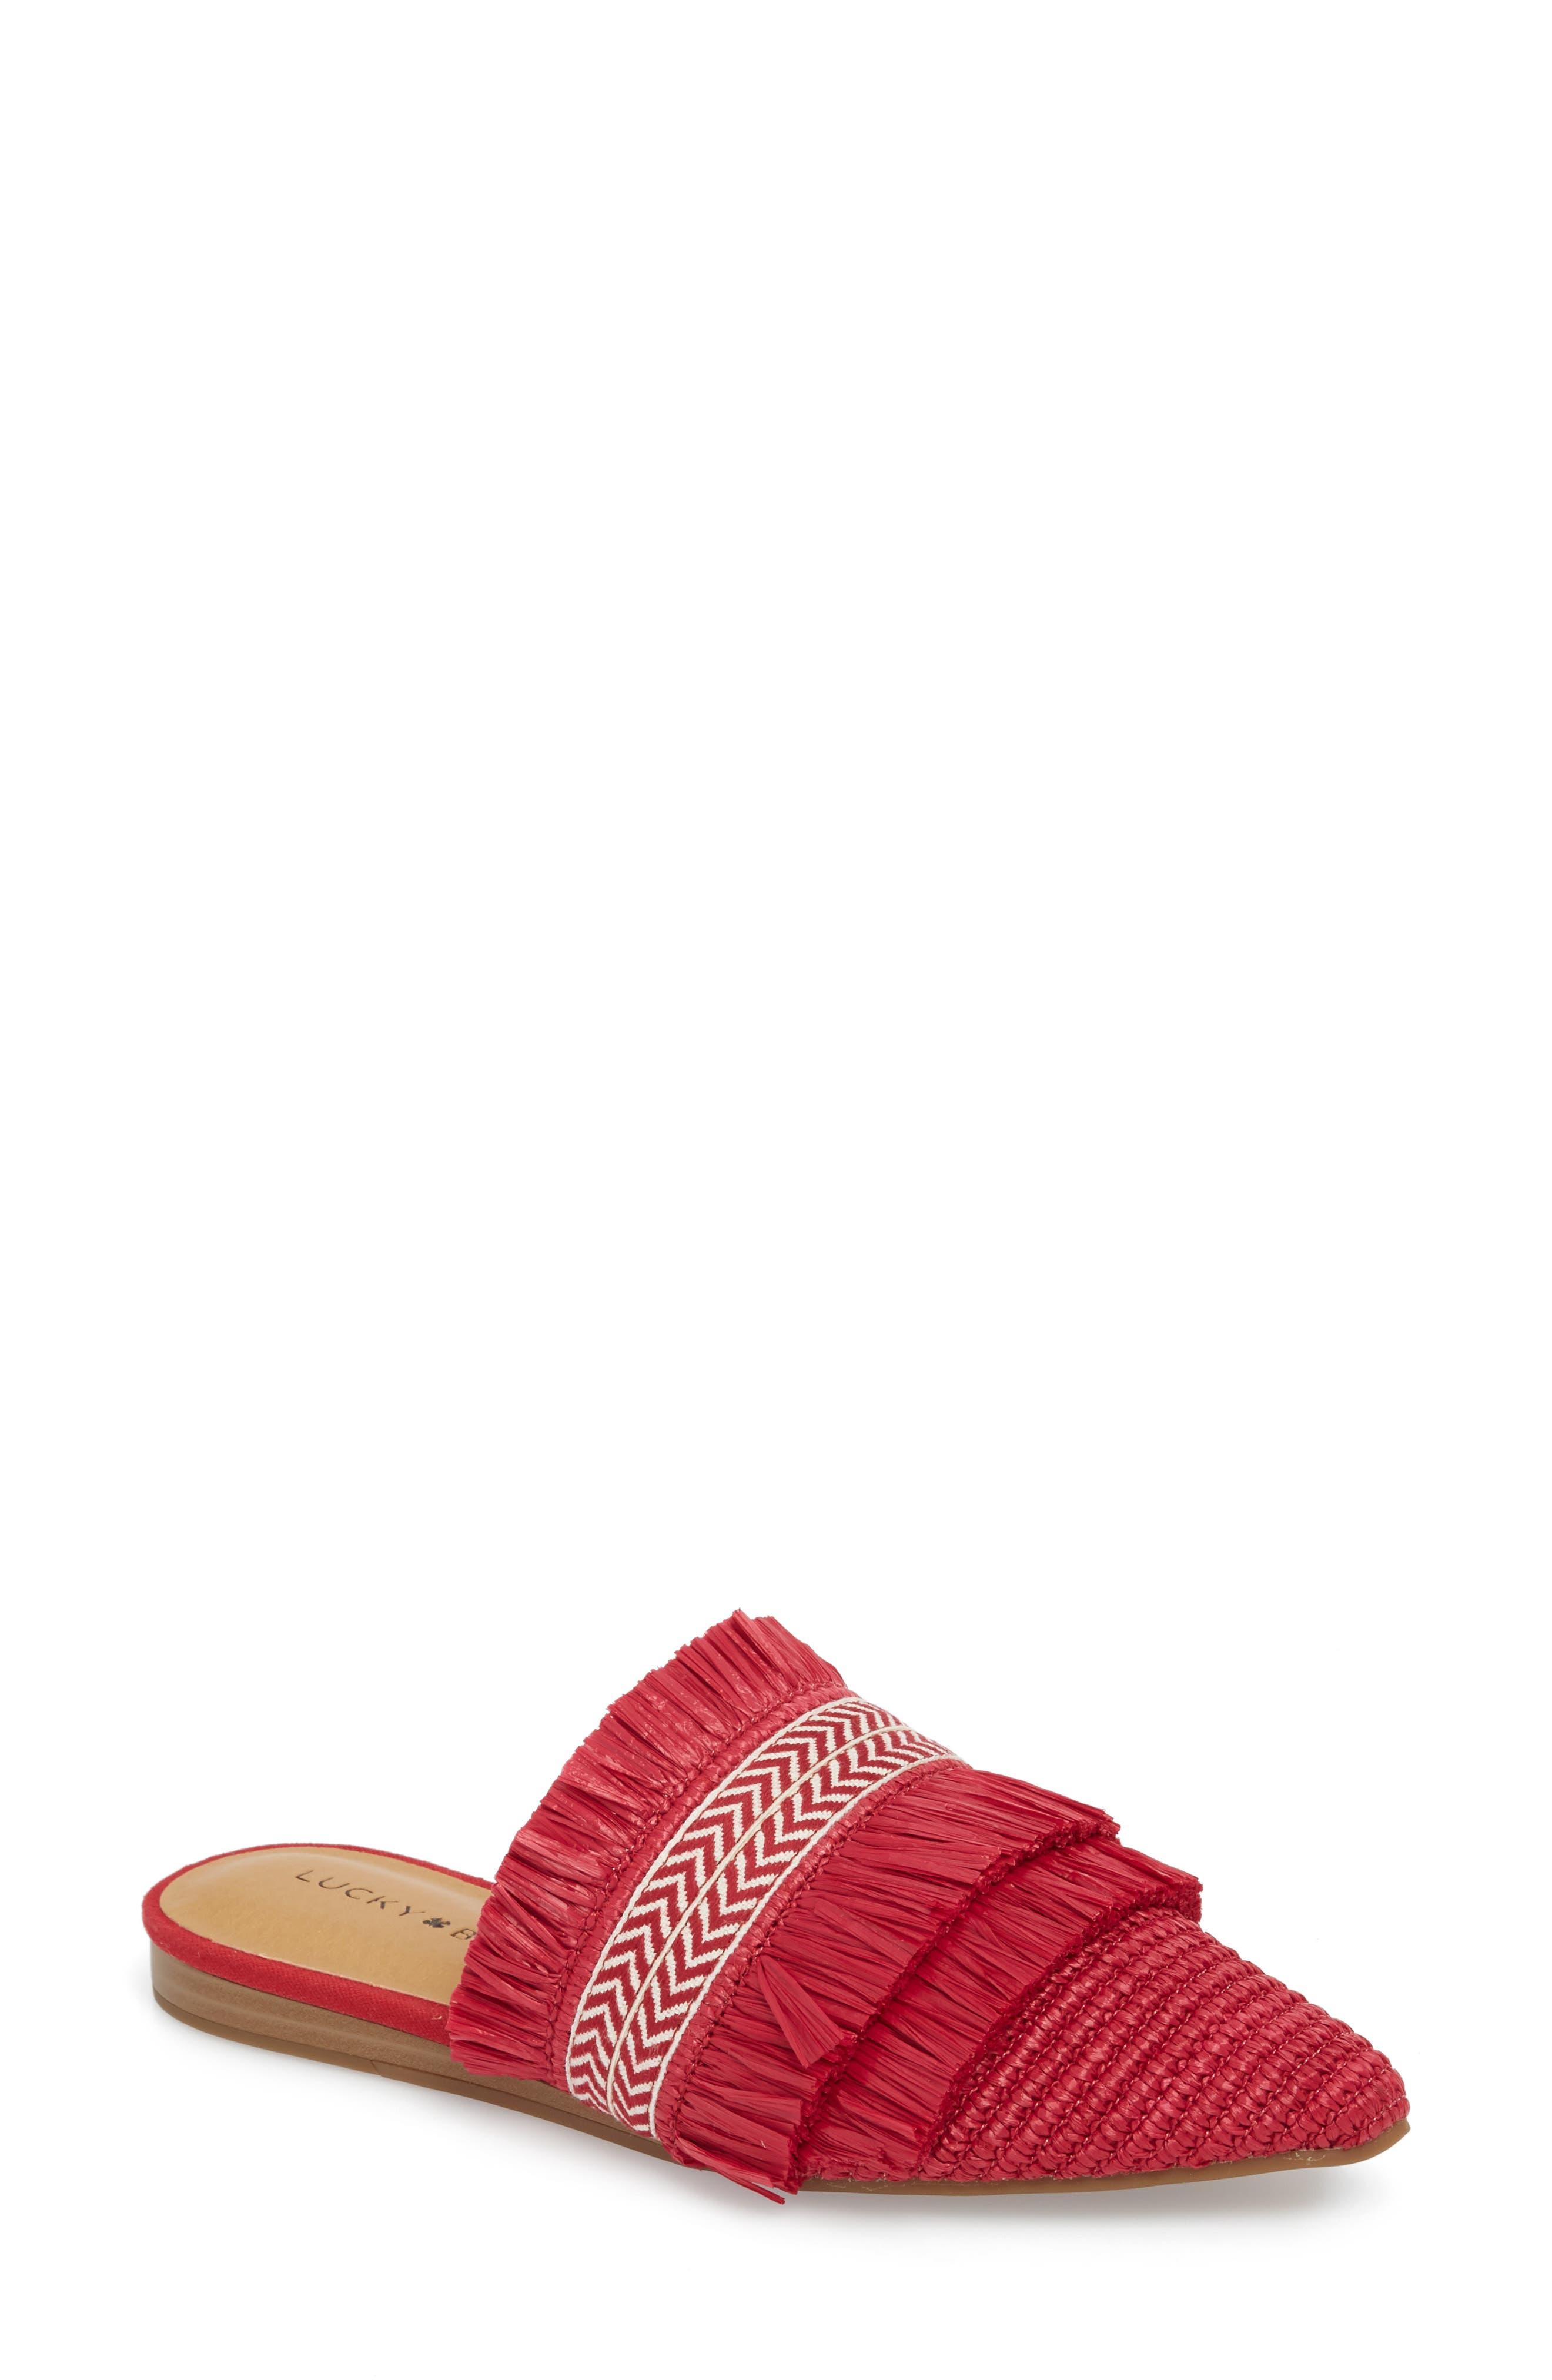 Baoss Mule,                         Main,                         color, Sb Red Leather